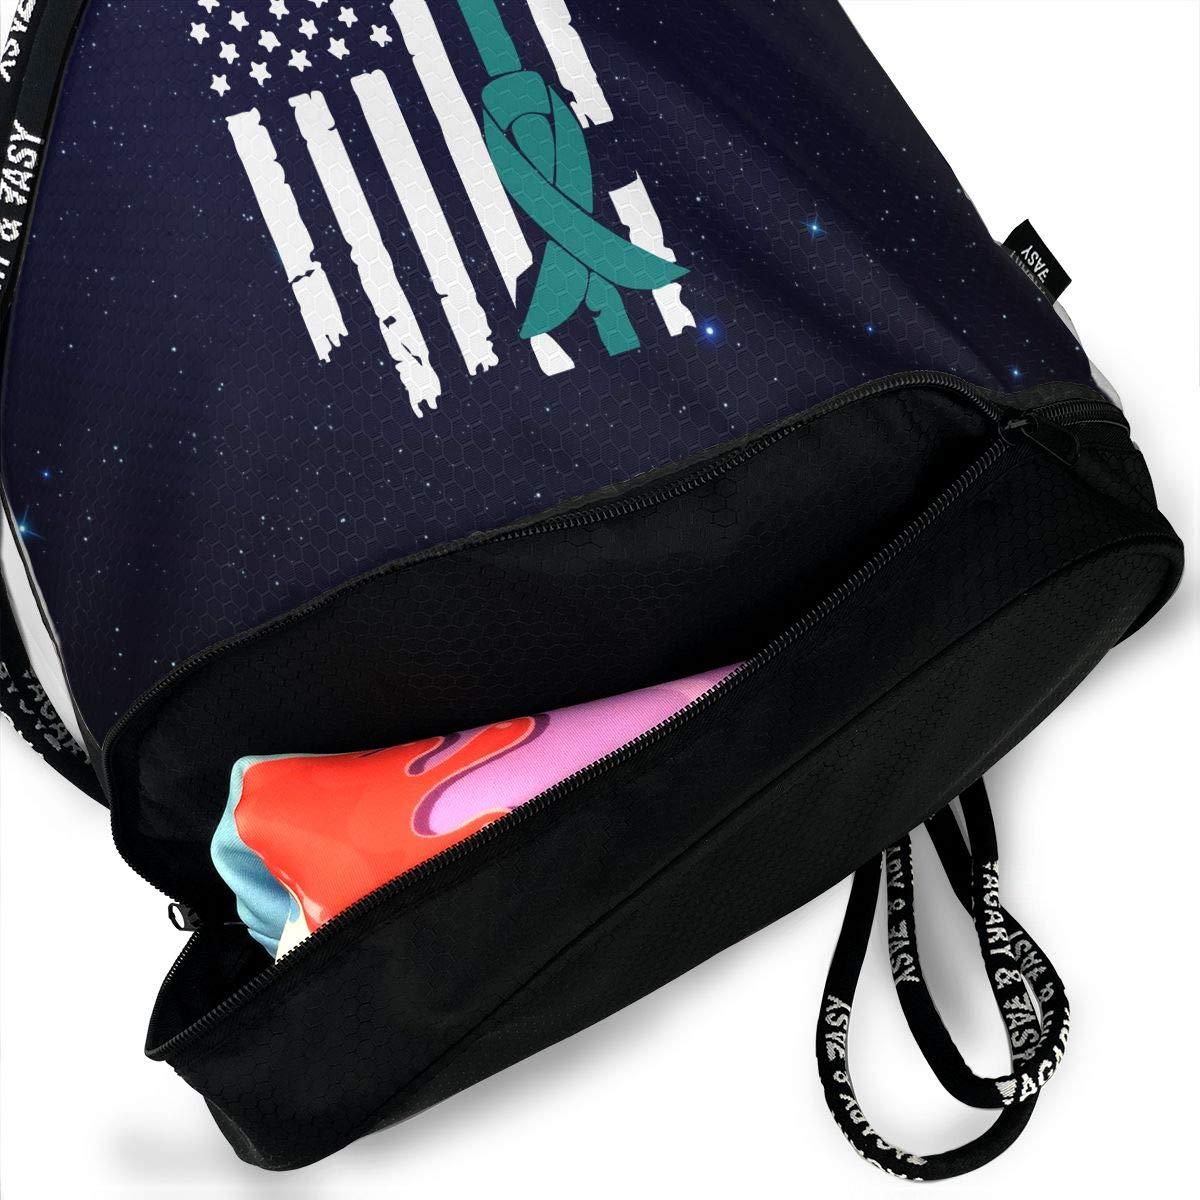 SG0HGO Drawstring Backpack Ovarian Cancer Awareness USA Flag-1 Men /& Women Yoga Dance Travel Shoulder Bags